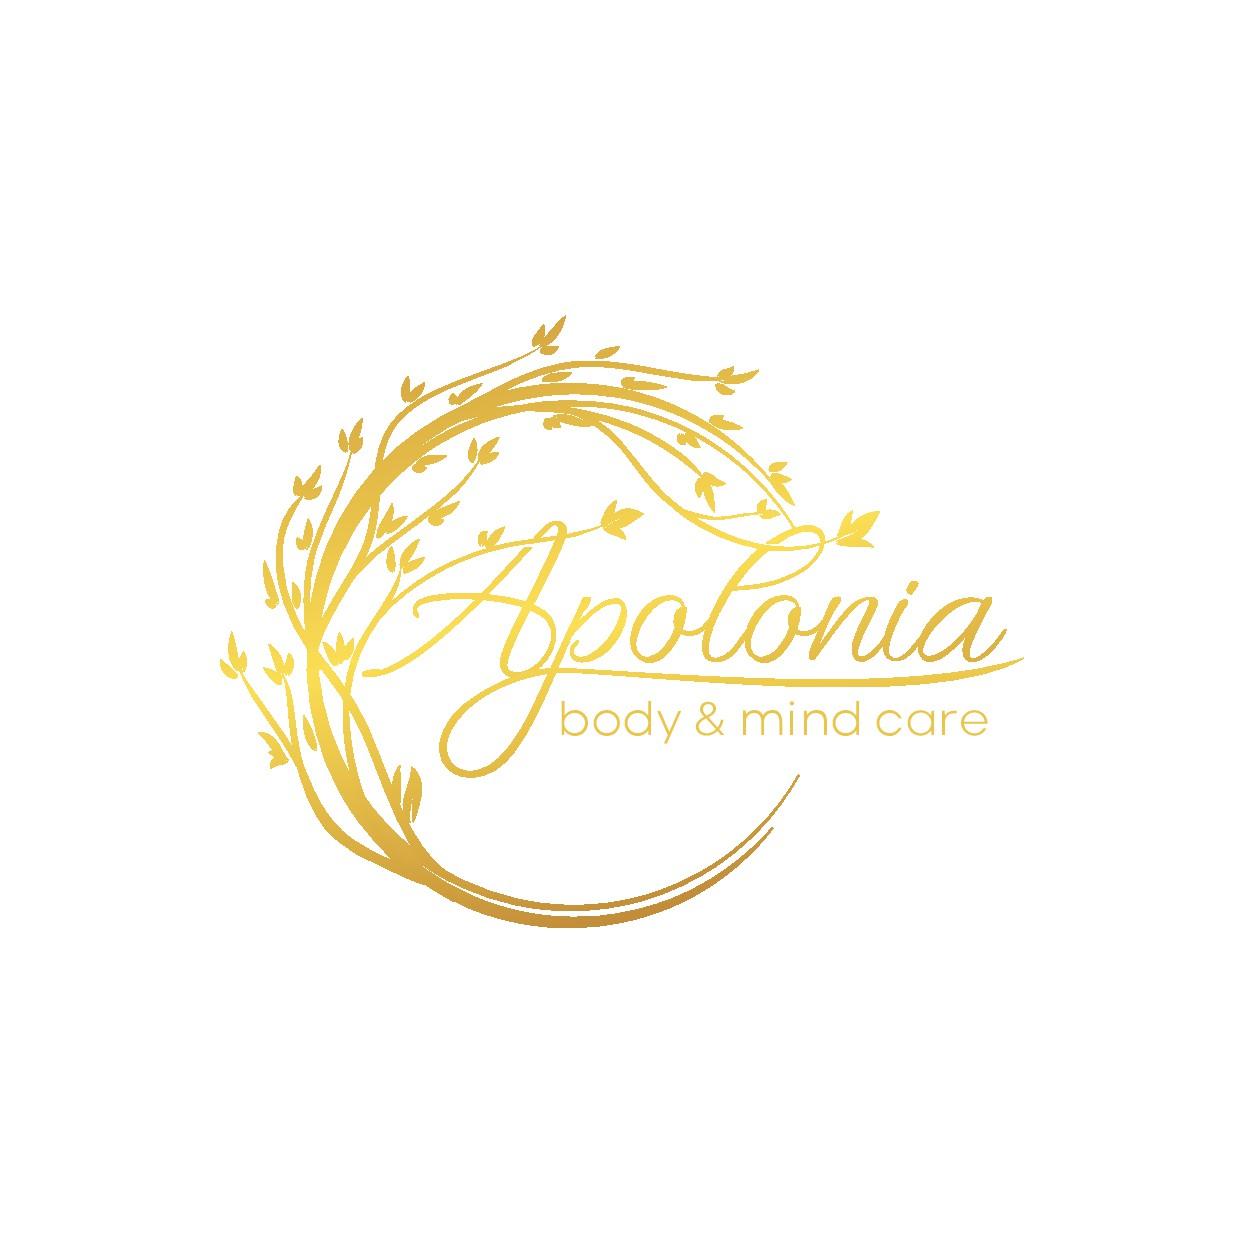 Design a fancy classy Woman empower logo